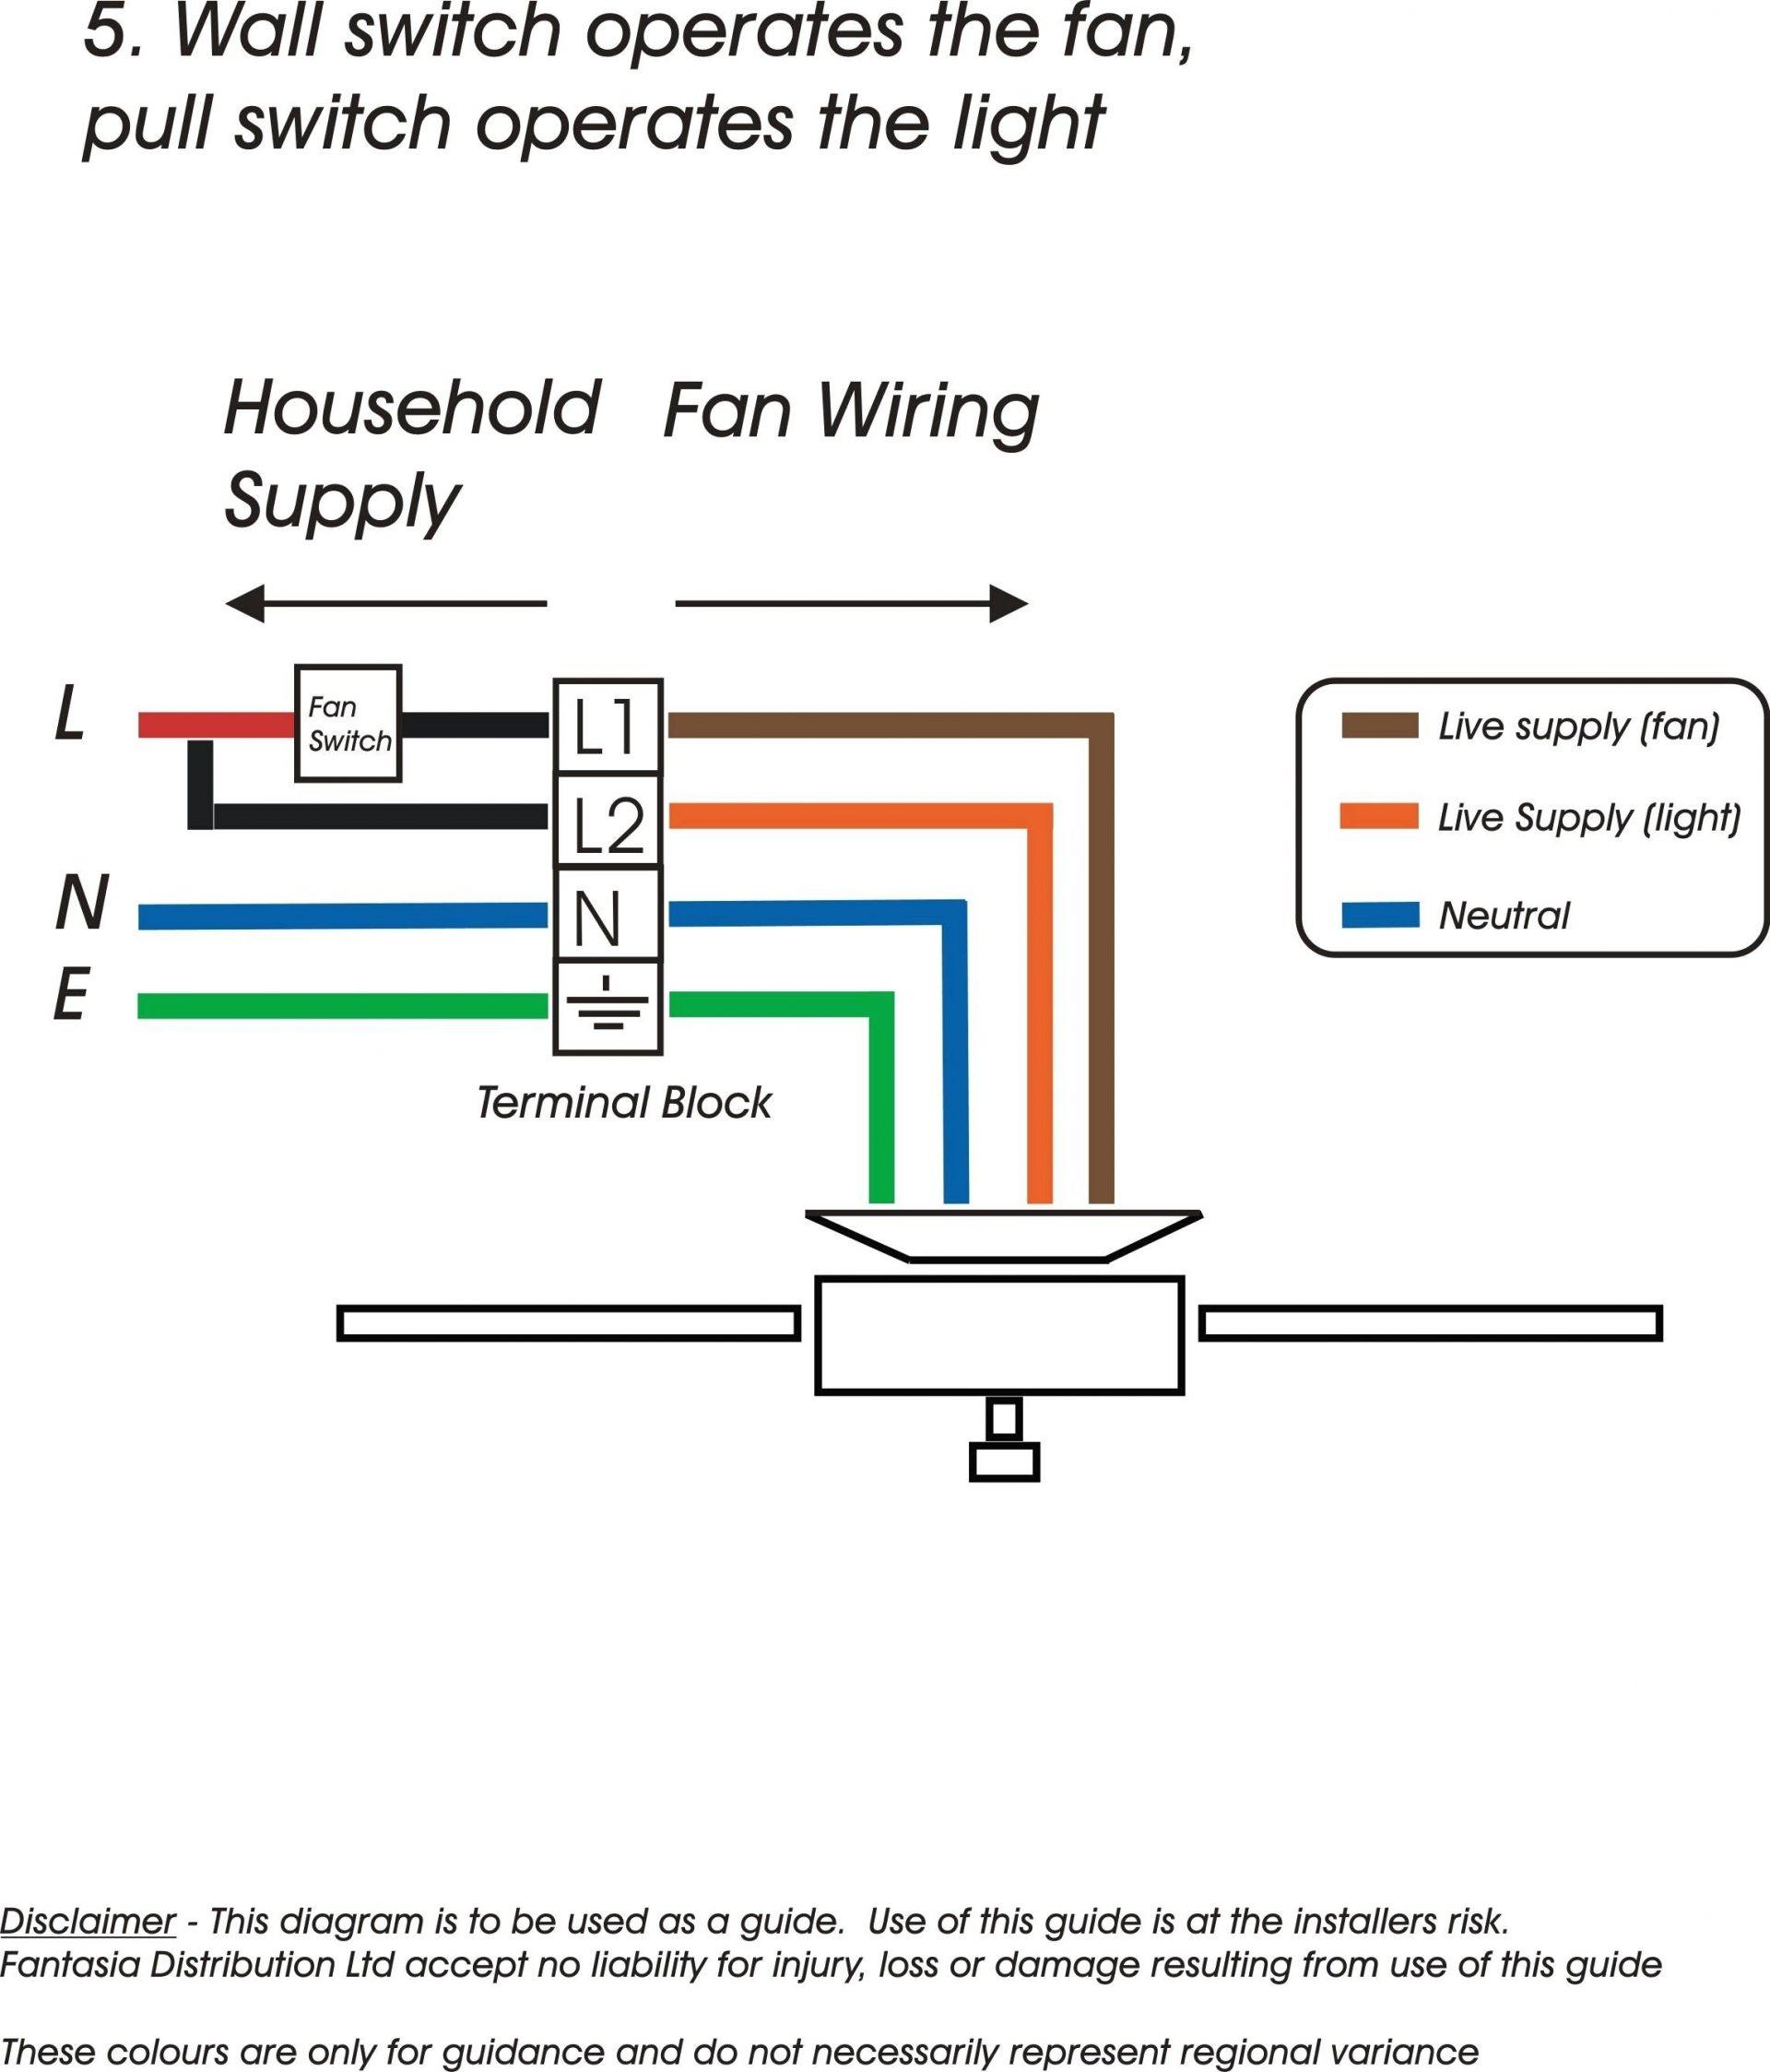 wiring diagram power sentry ps300 4k wallpapers design rh imageswiki info ps300 emergency ballast wiring diagram Universal Ballast Wiring Diagrams